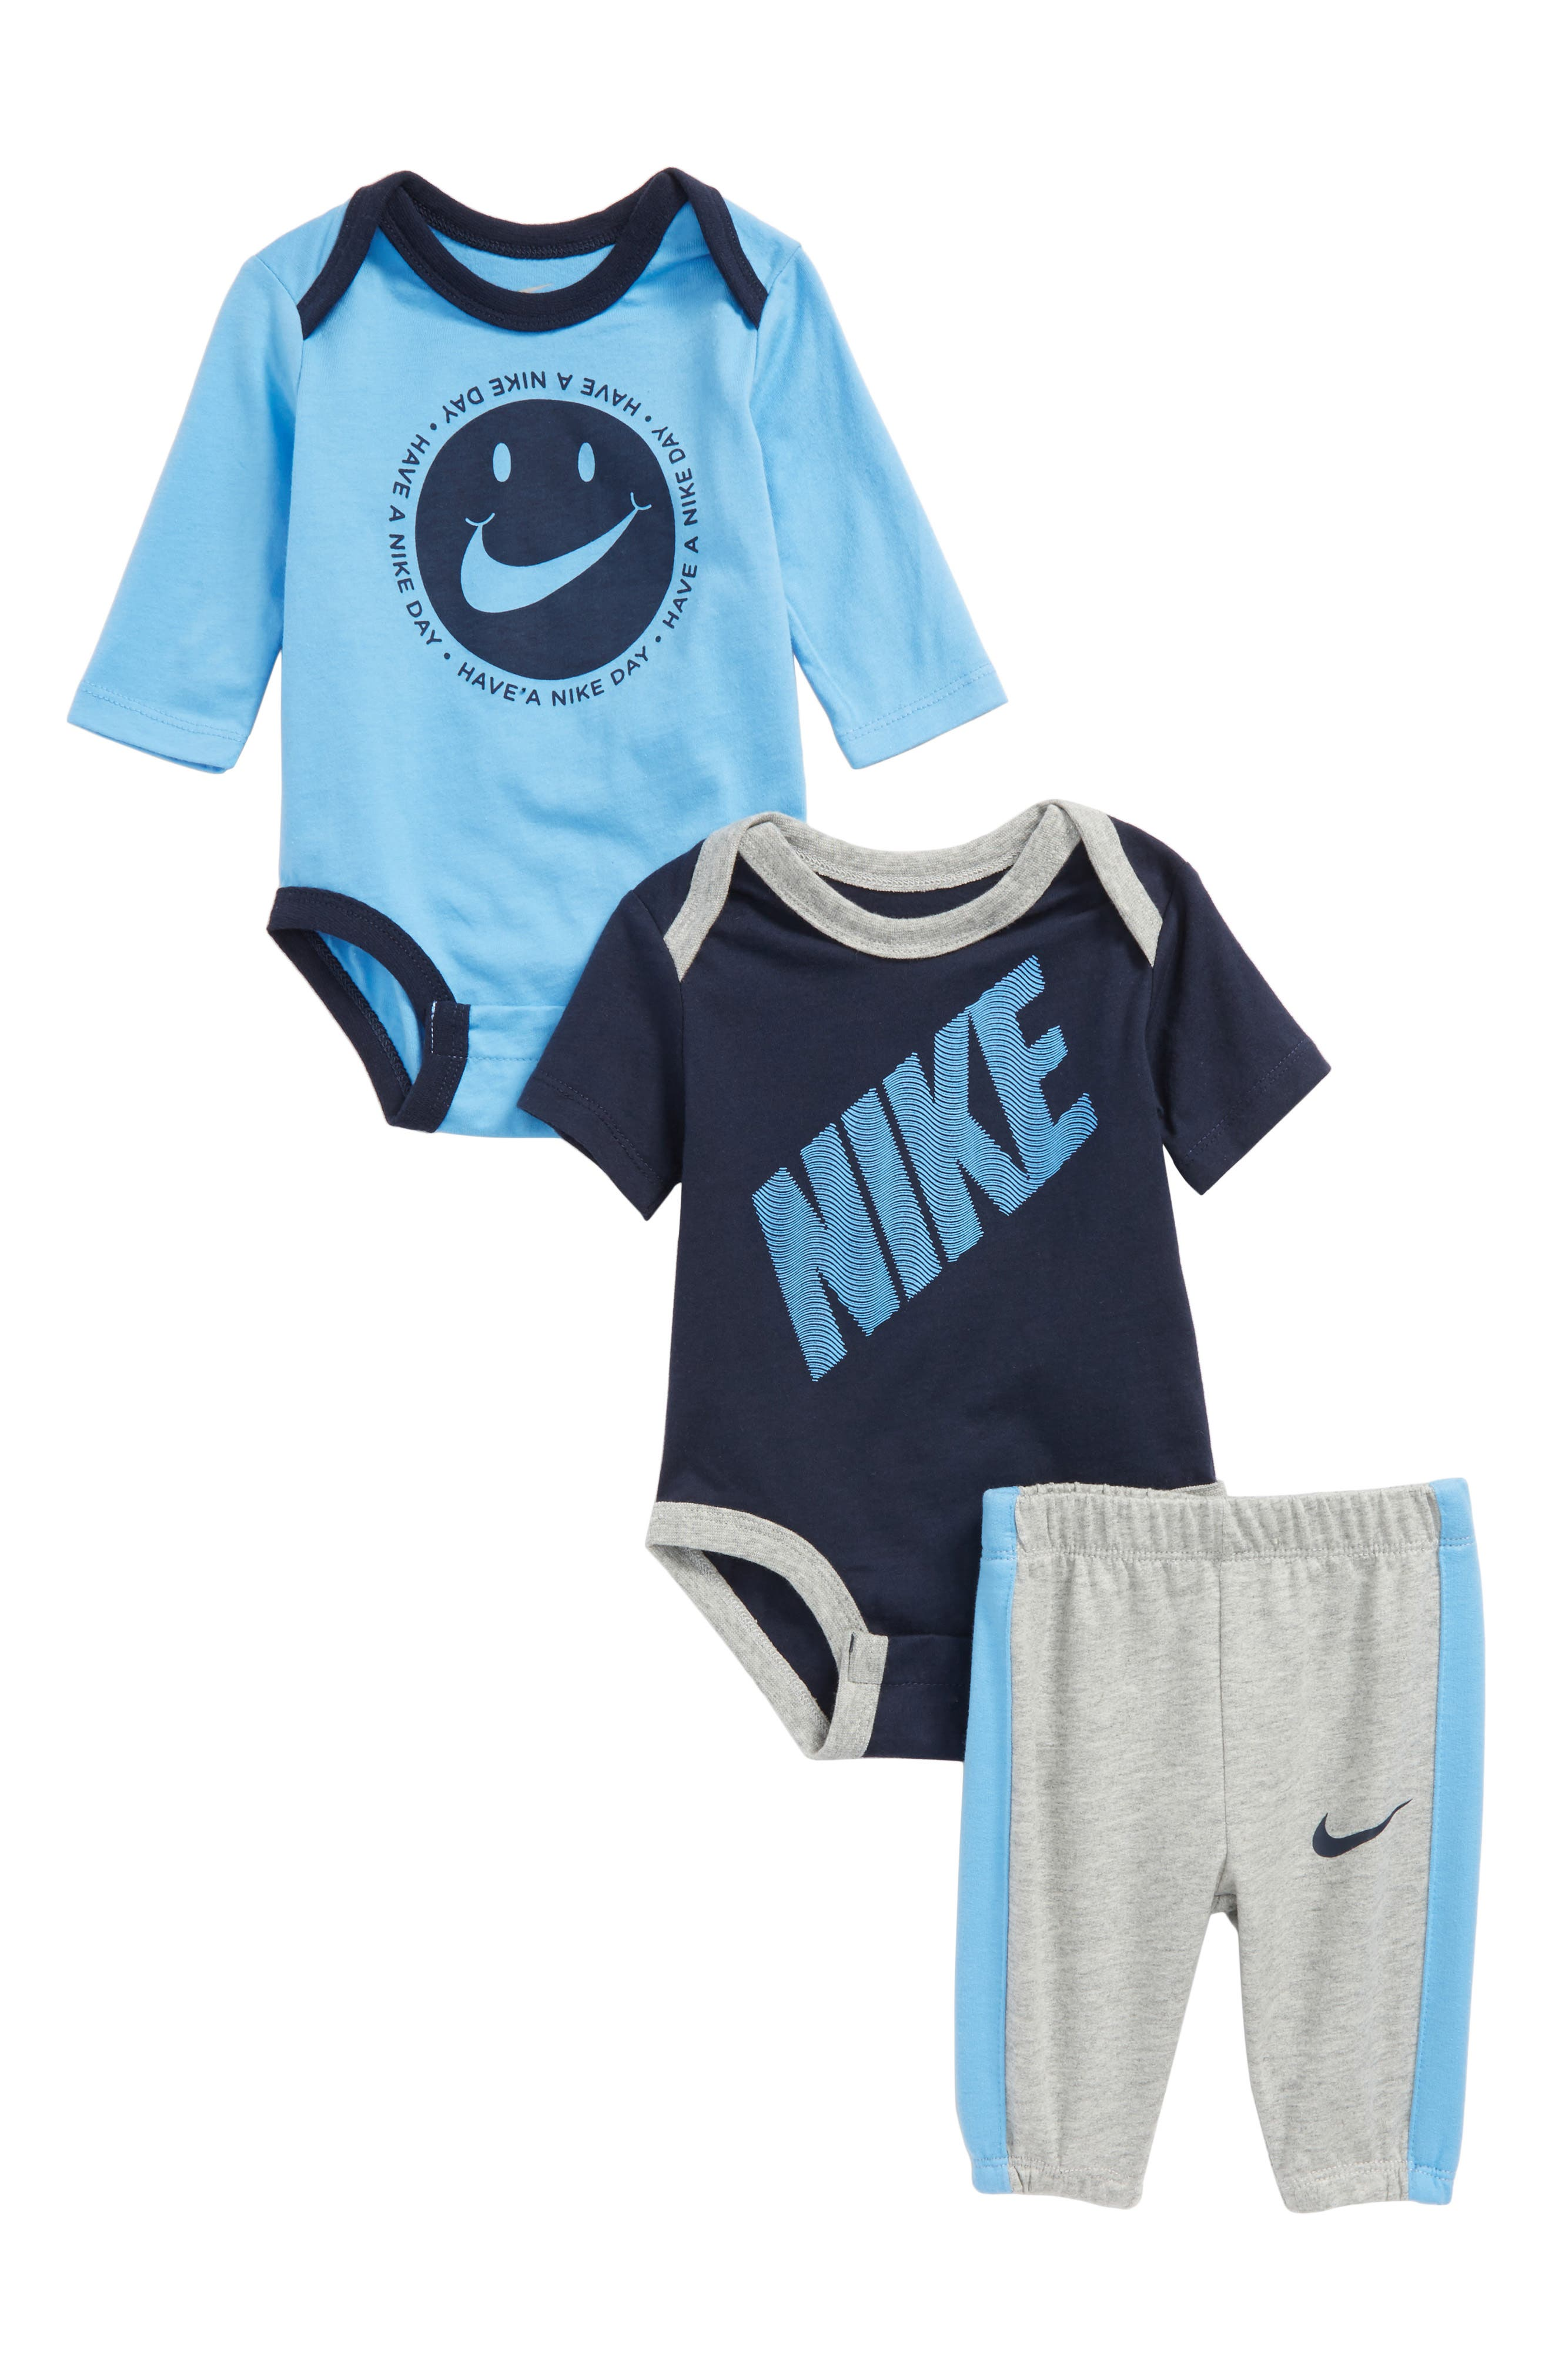 Alternate Image 1 Selected - Nike DNA 3-Piece Bodysuit & Pants Set (Baby Boys)